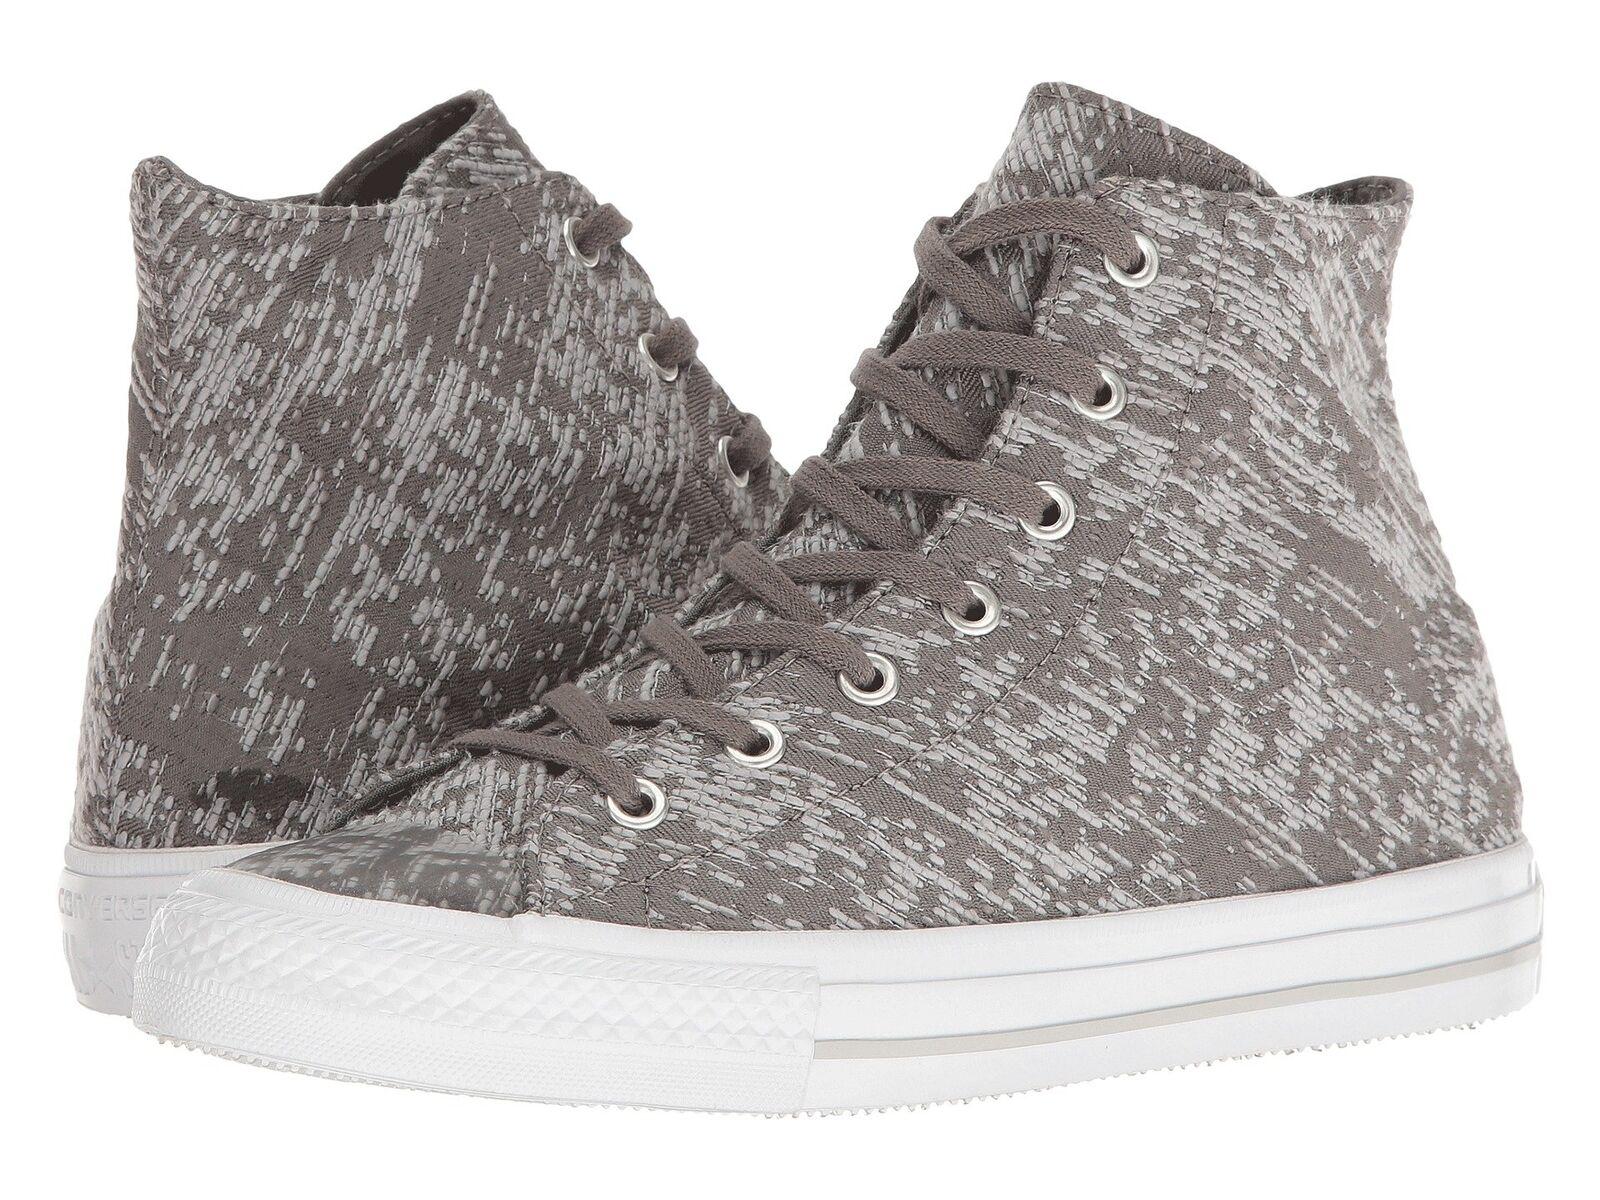 Converse CT All Star Gemma Knit Hi Women's Sneakers Size 7 C